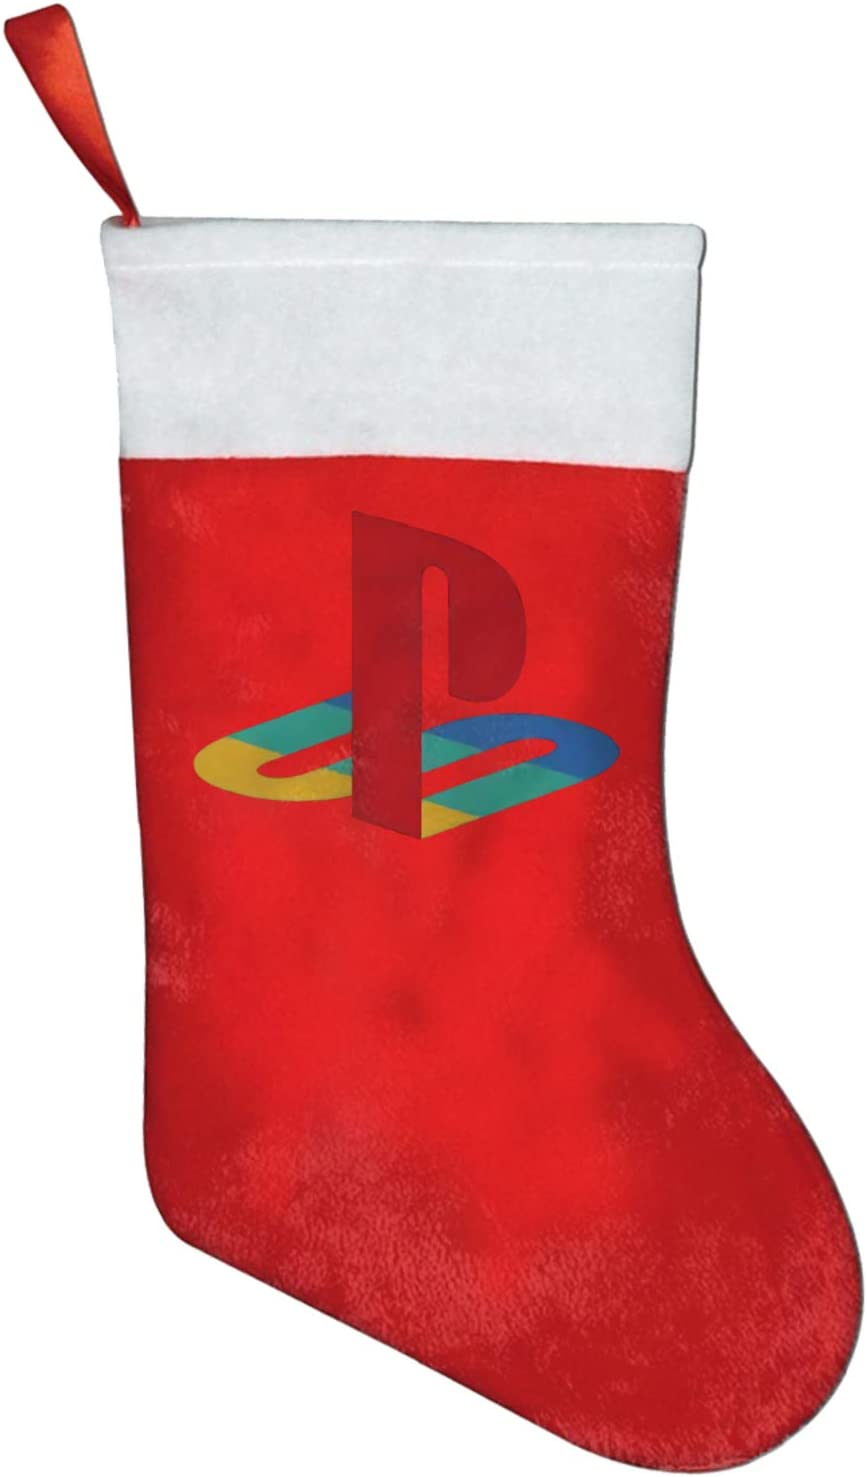 Playstation Kids Cosy Socks 2 Pairs Winter Warm Unisex Children Socks Xmas Gift